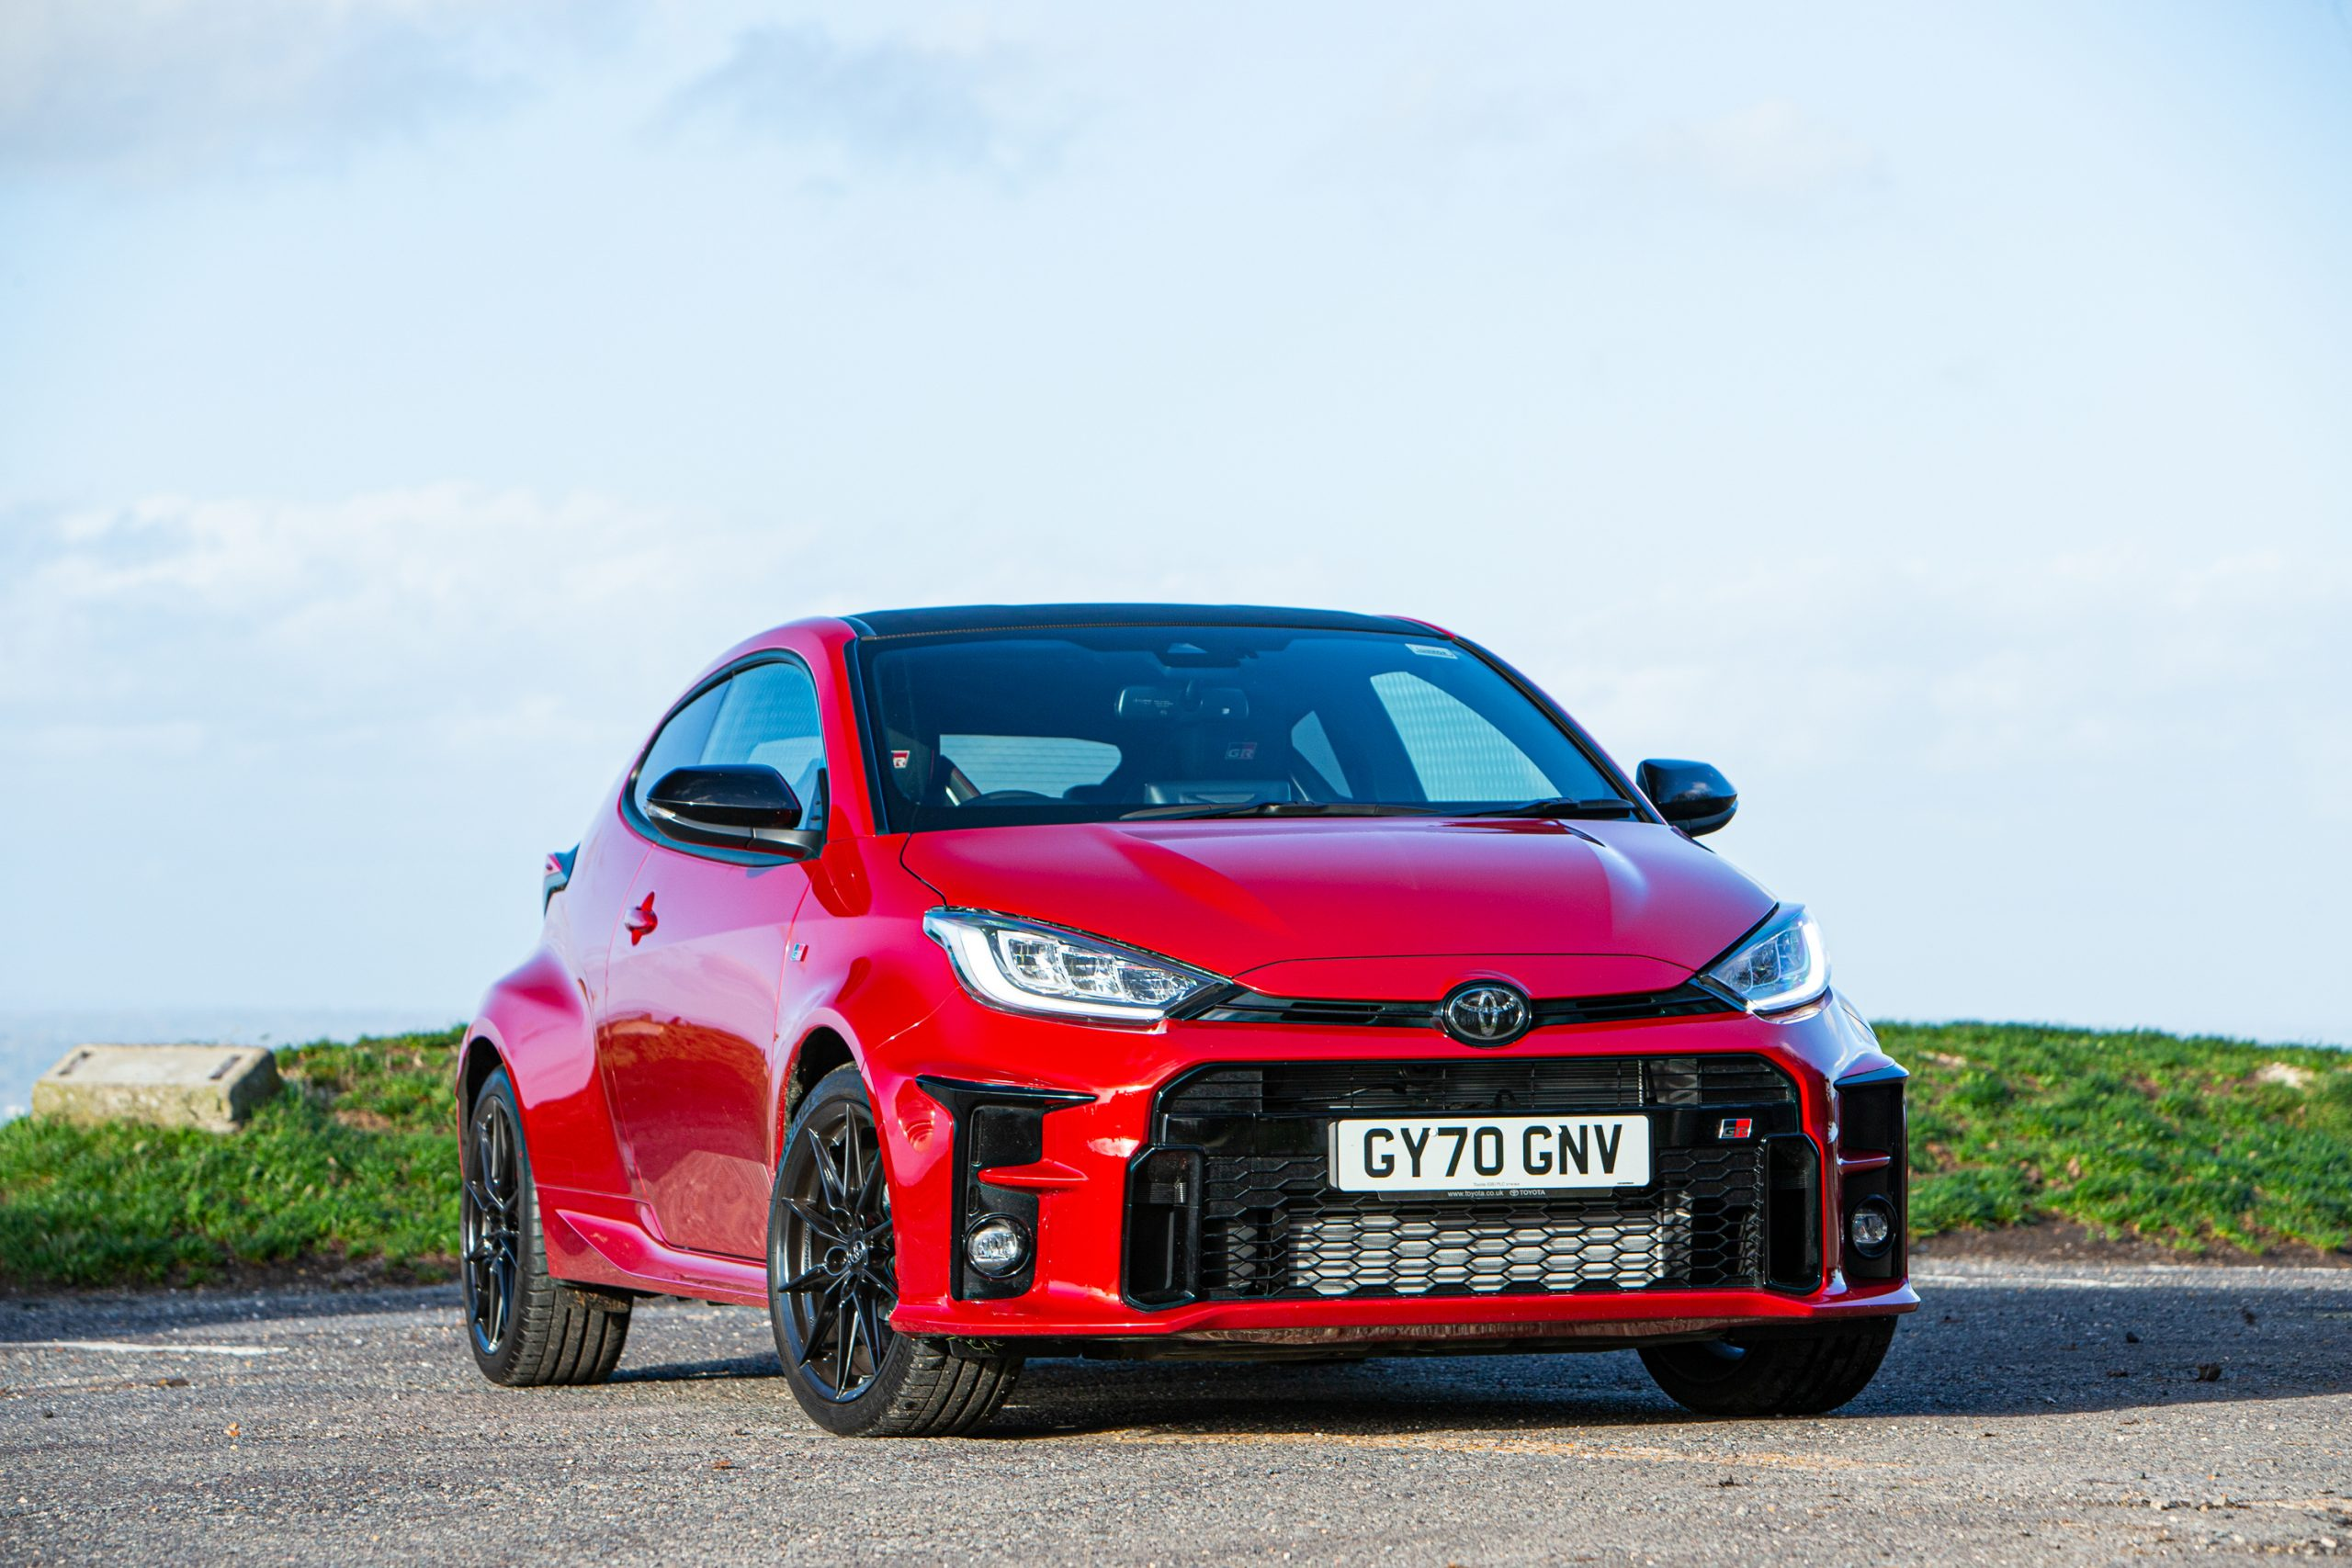 Miniature hero: Toyota GR Yaris review